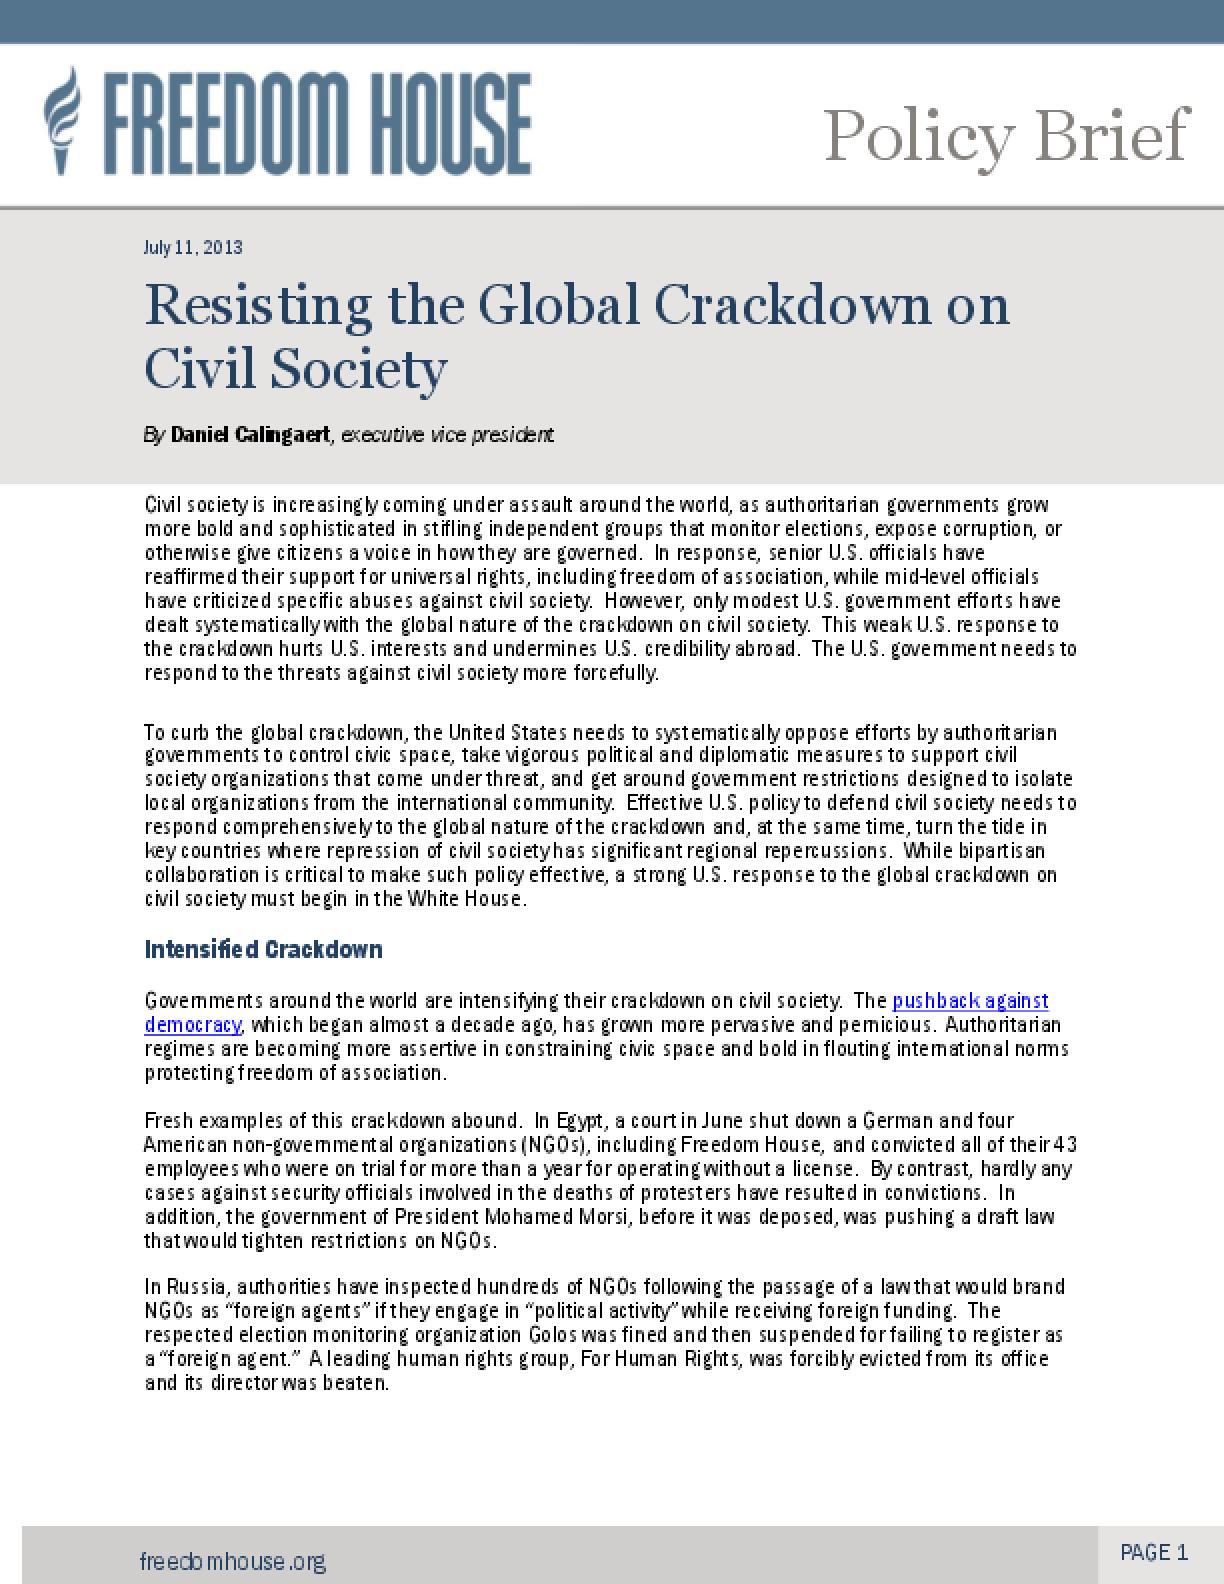 Resisting the Global Crackdown on Civil Society